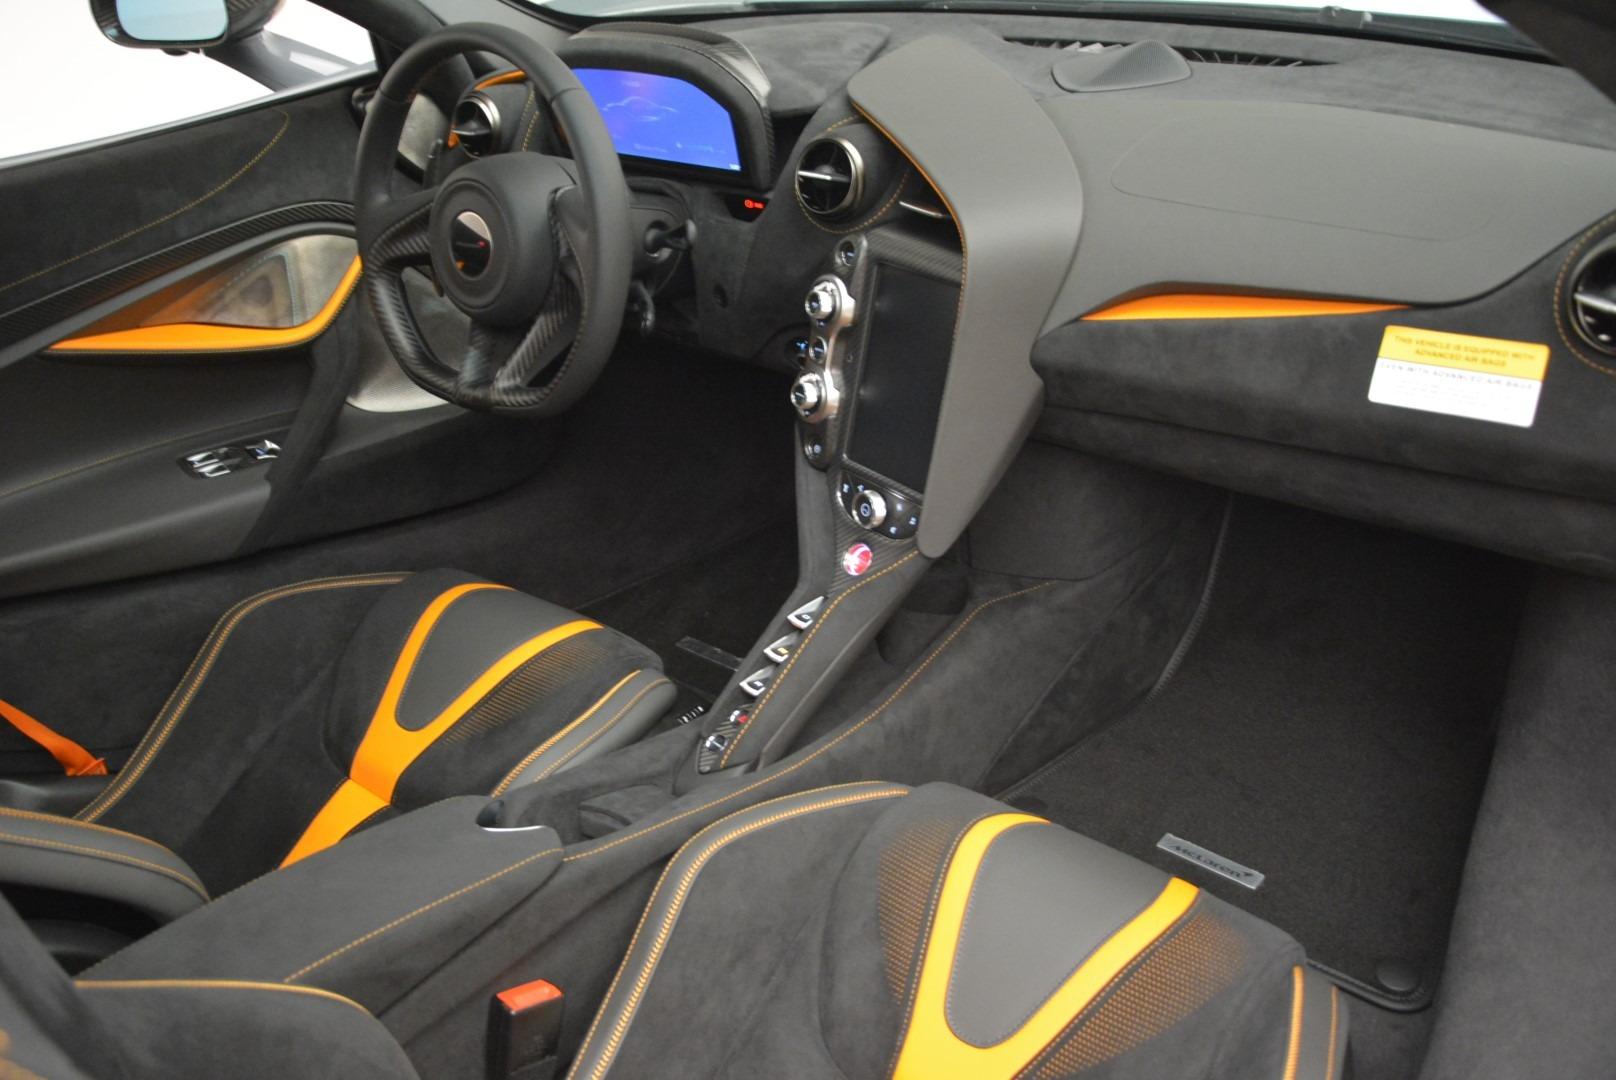 Used 2018 McLaren 720S Coupe For Sale In Westport, CT 3205_p18